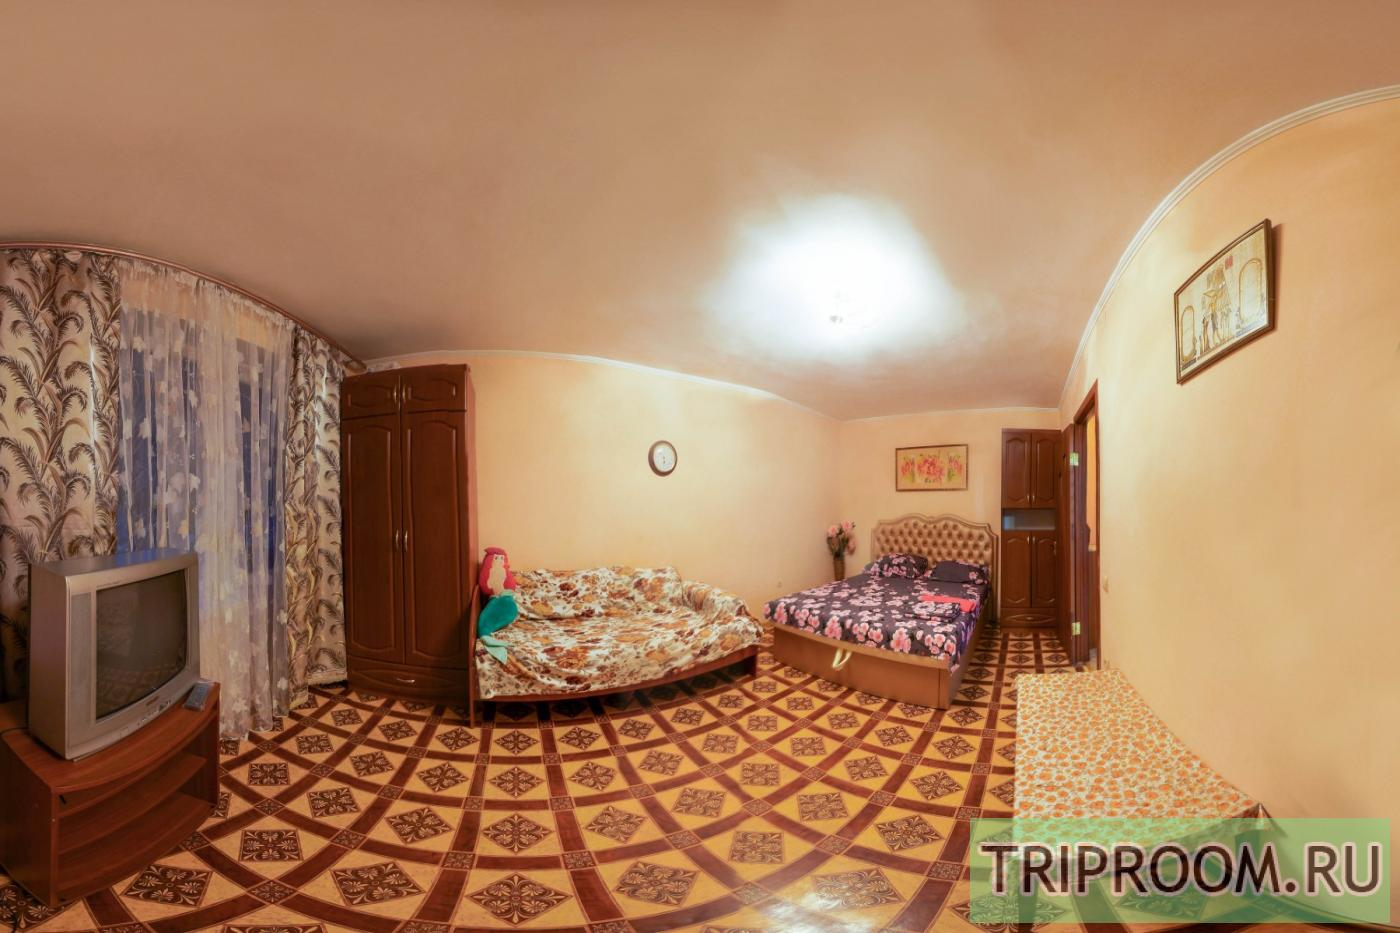 1-комнатная квартира посуточно (вариант № 29731), ул. Кирова улица, фото № 4